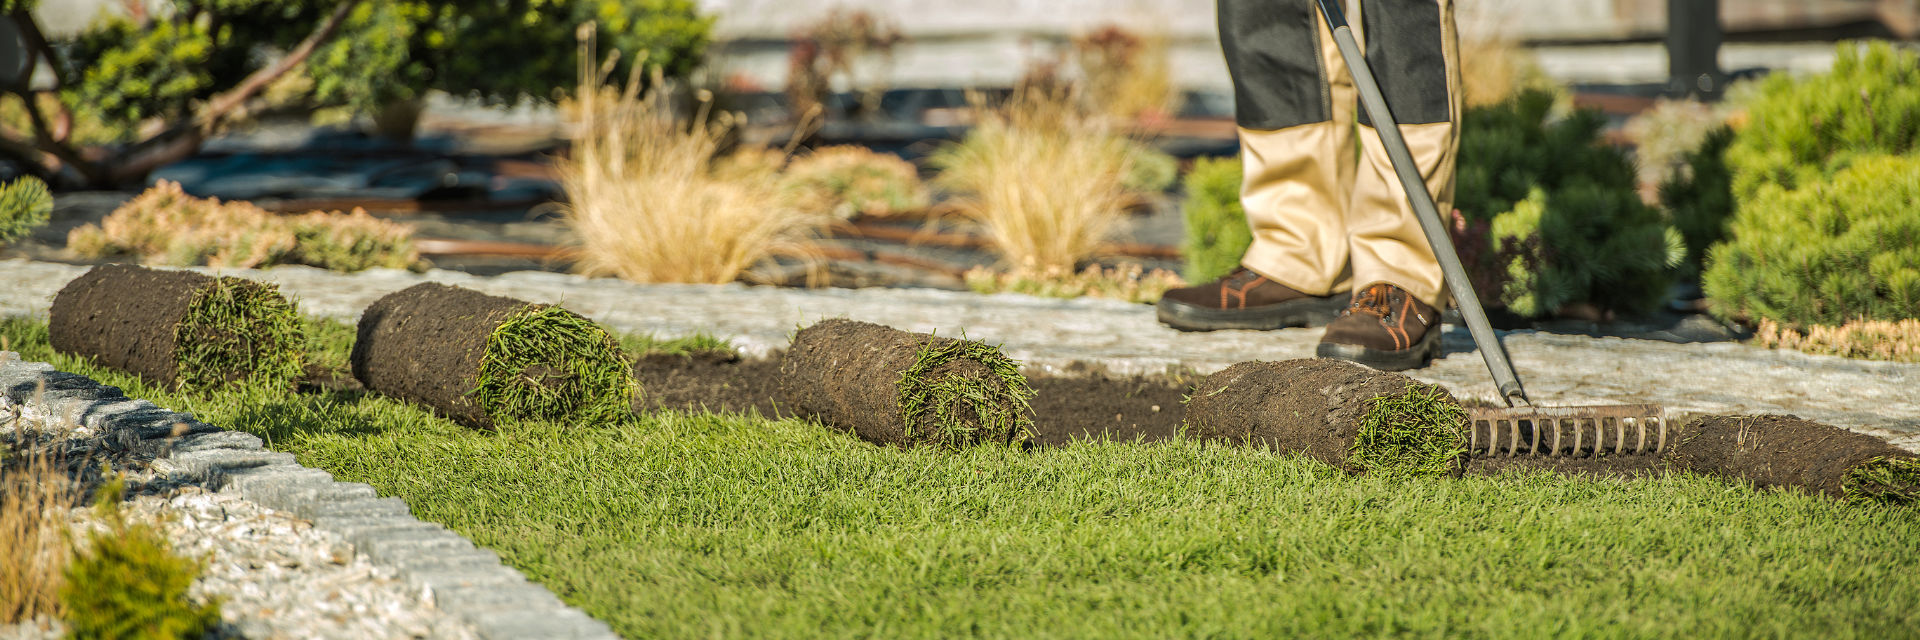 Professional landscaper installing sod